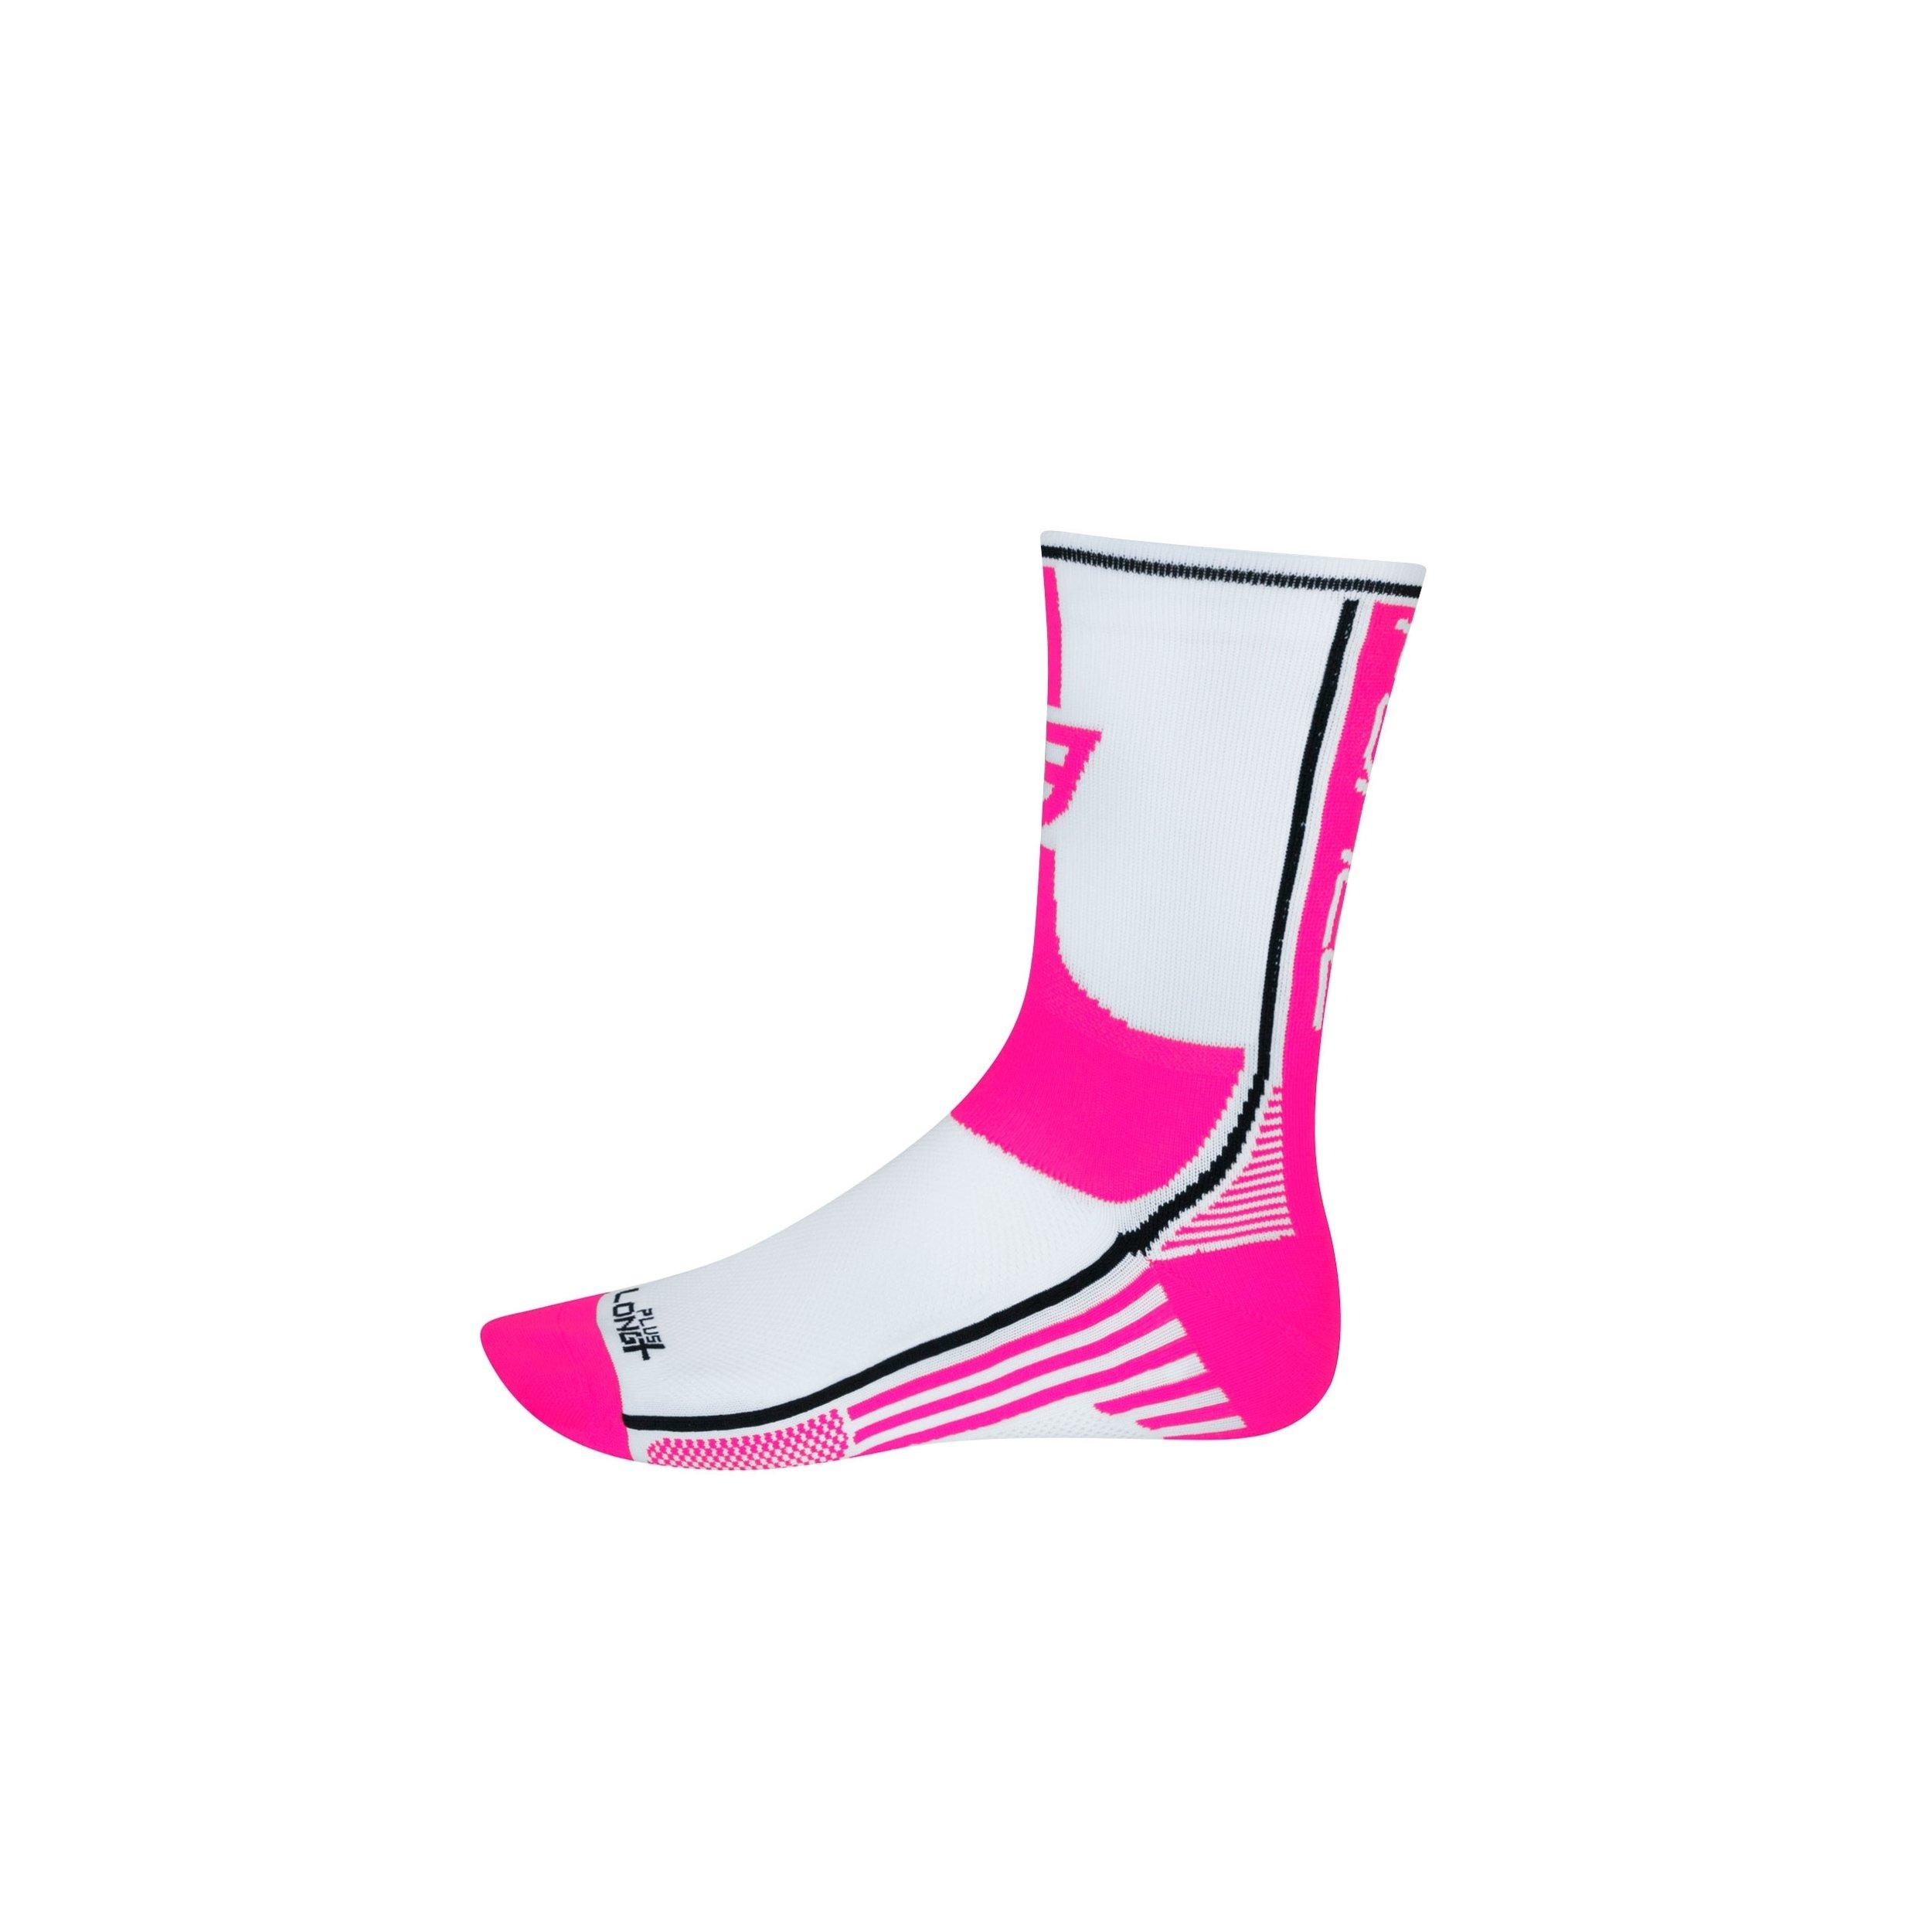 Force Long cykelsokker hvid/pink   Socks